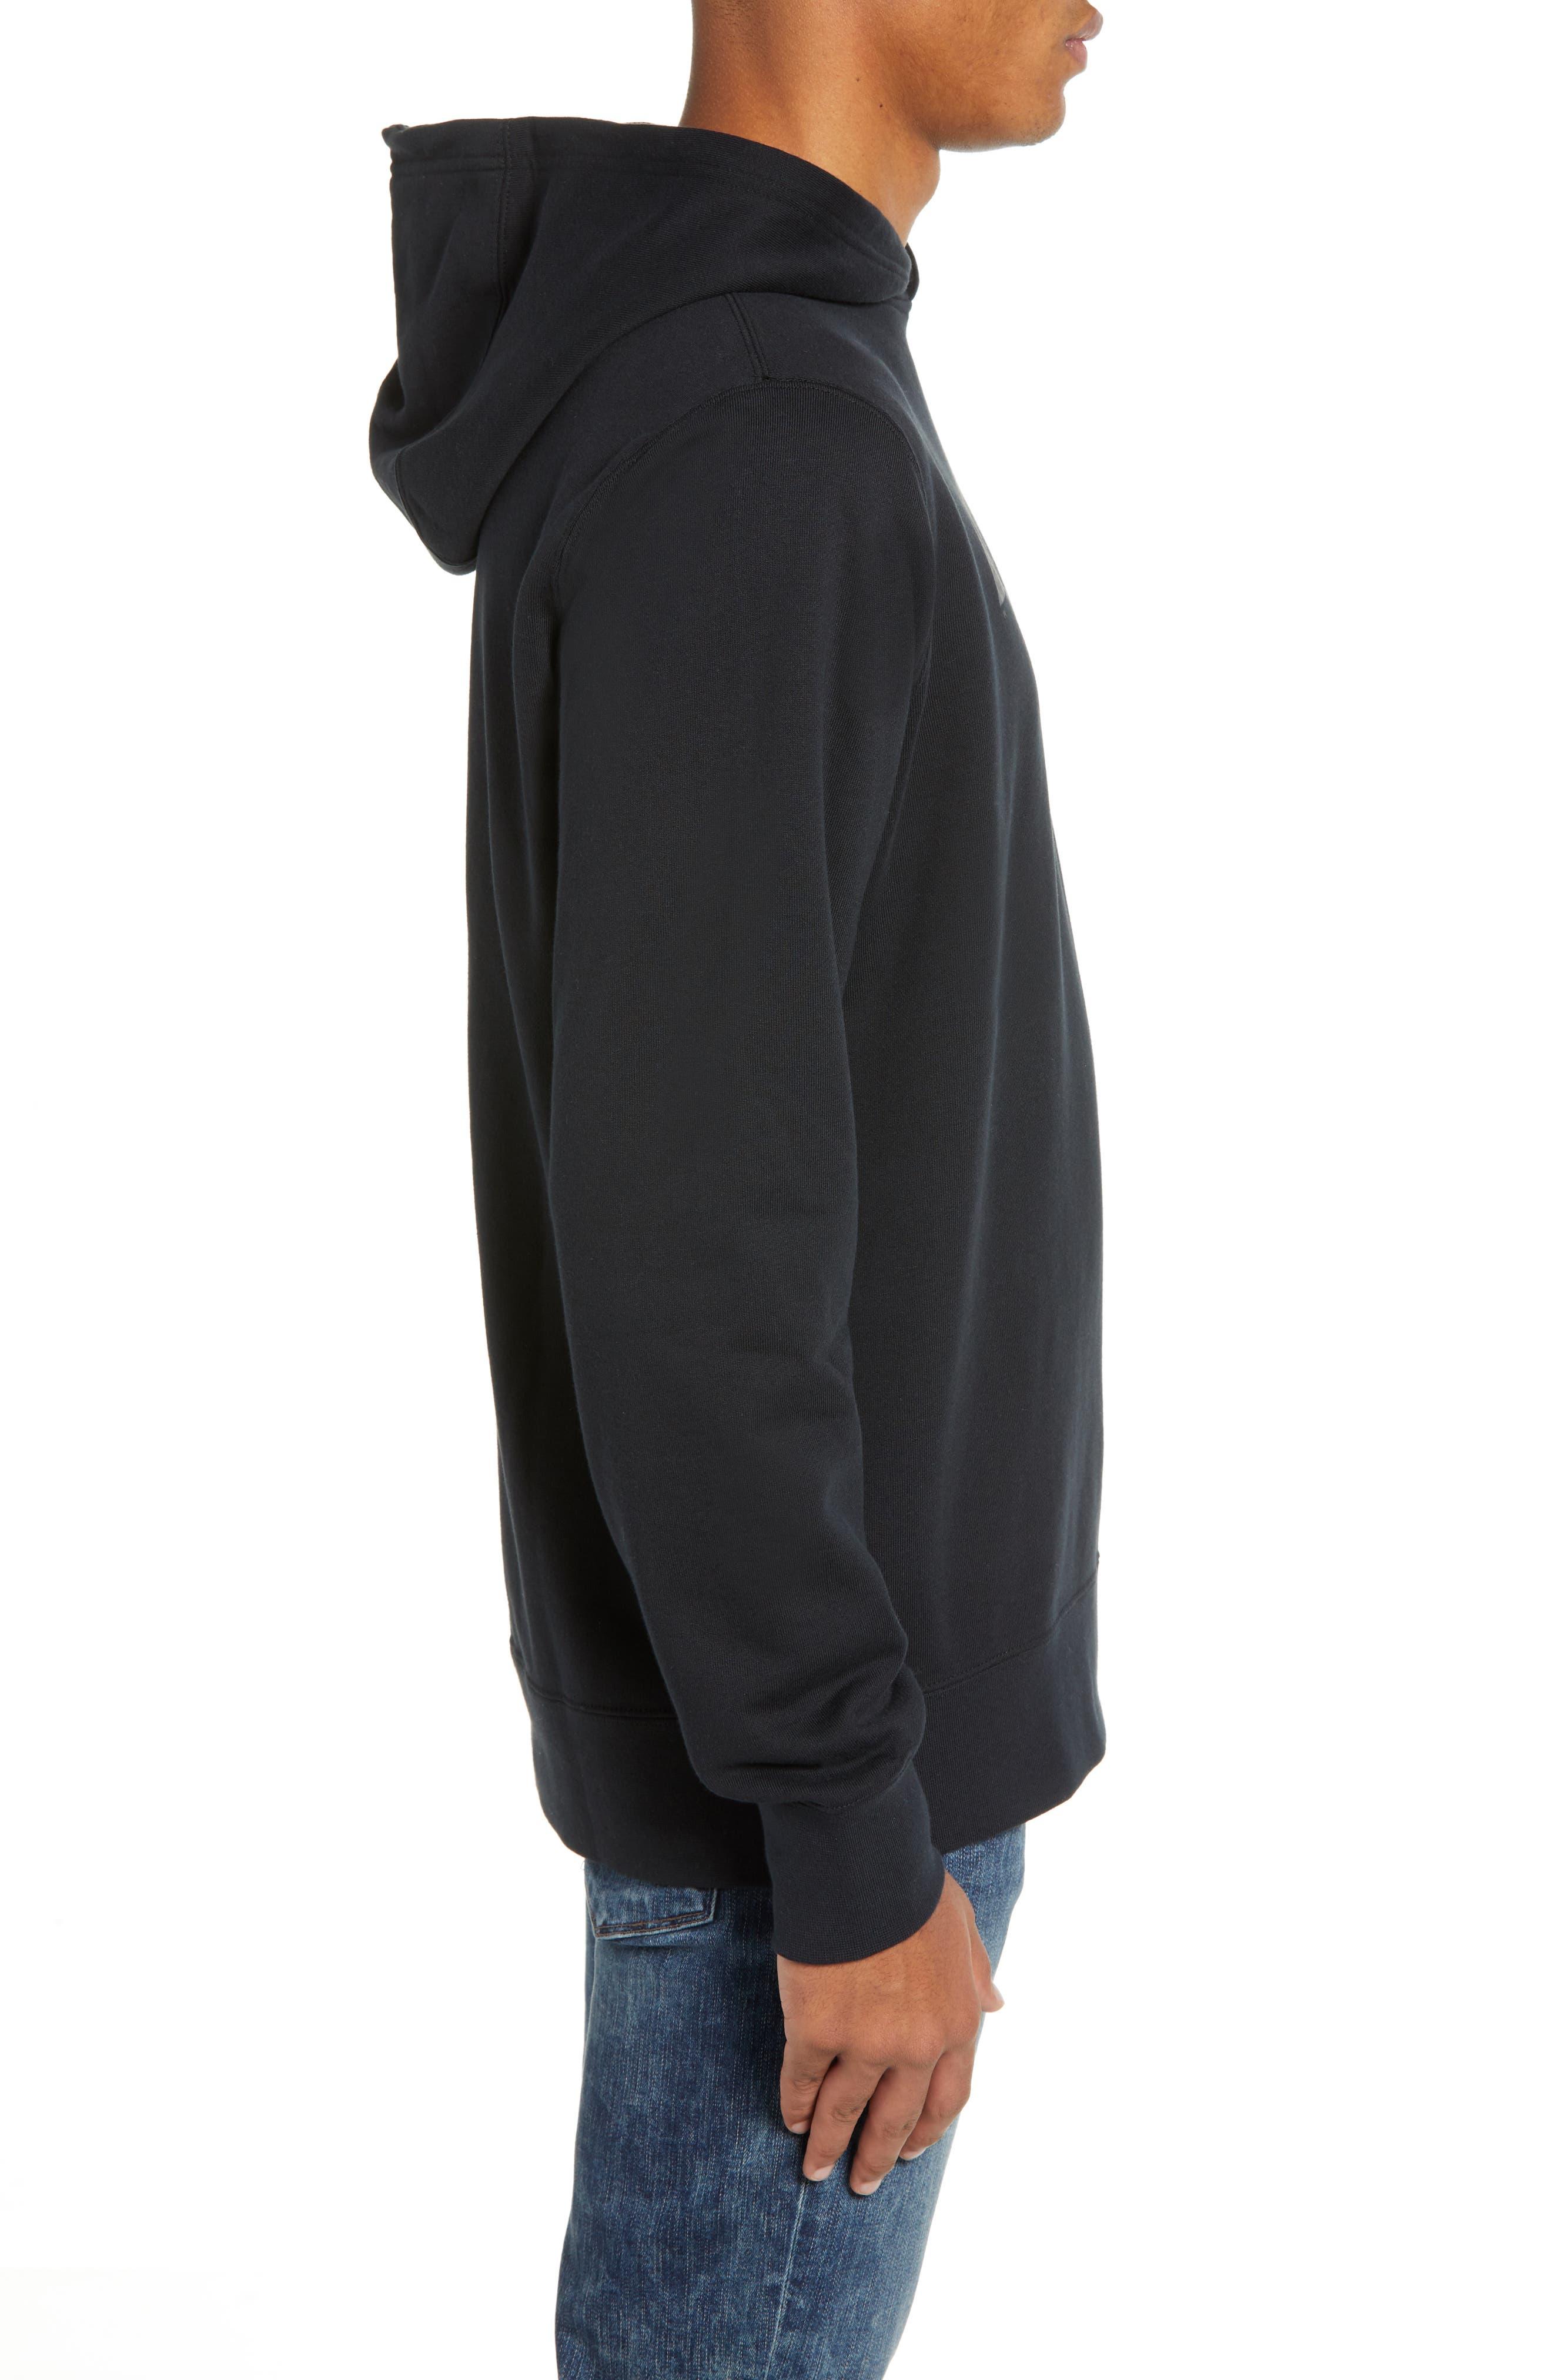 Sportswear ACG Pullover Hoodie,                             Alternate thumbnail 3, color,                             BLACK/ BLACK